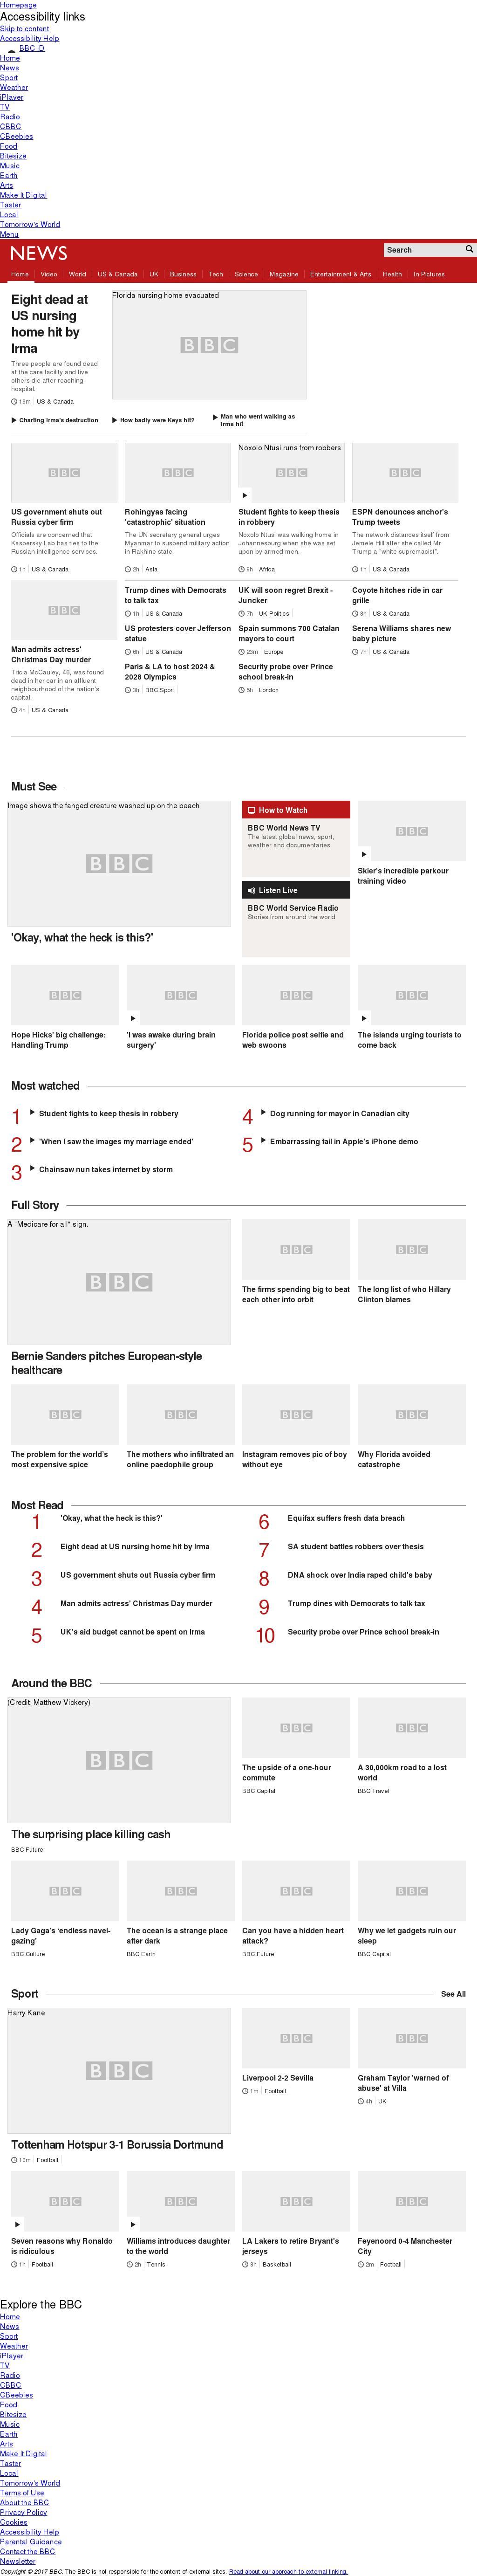 BBC at Wednesday Sept. 13, 2017, 10:01 p.m. UTC